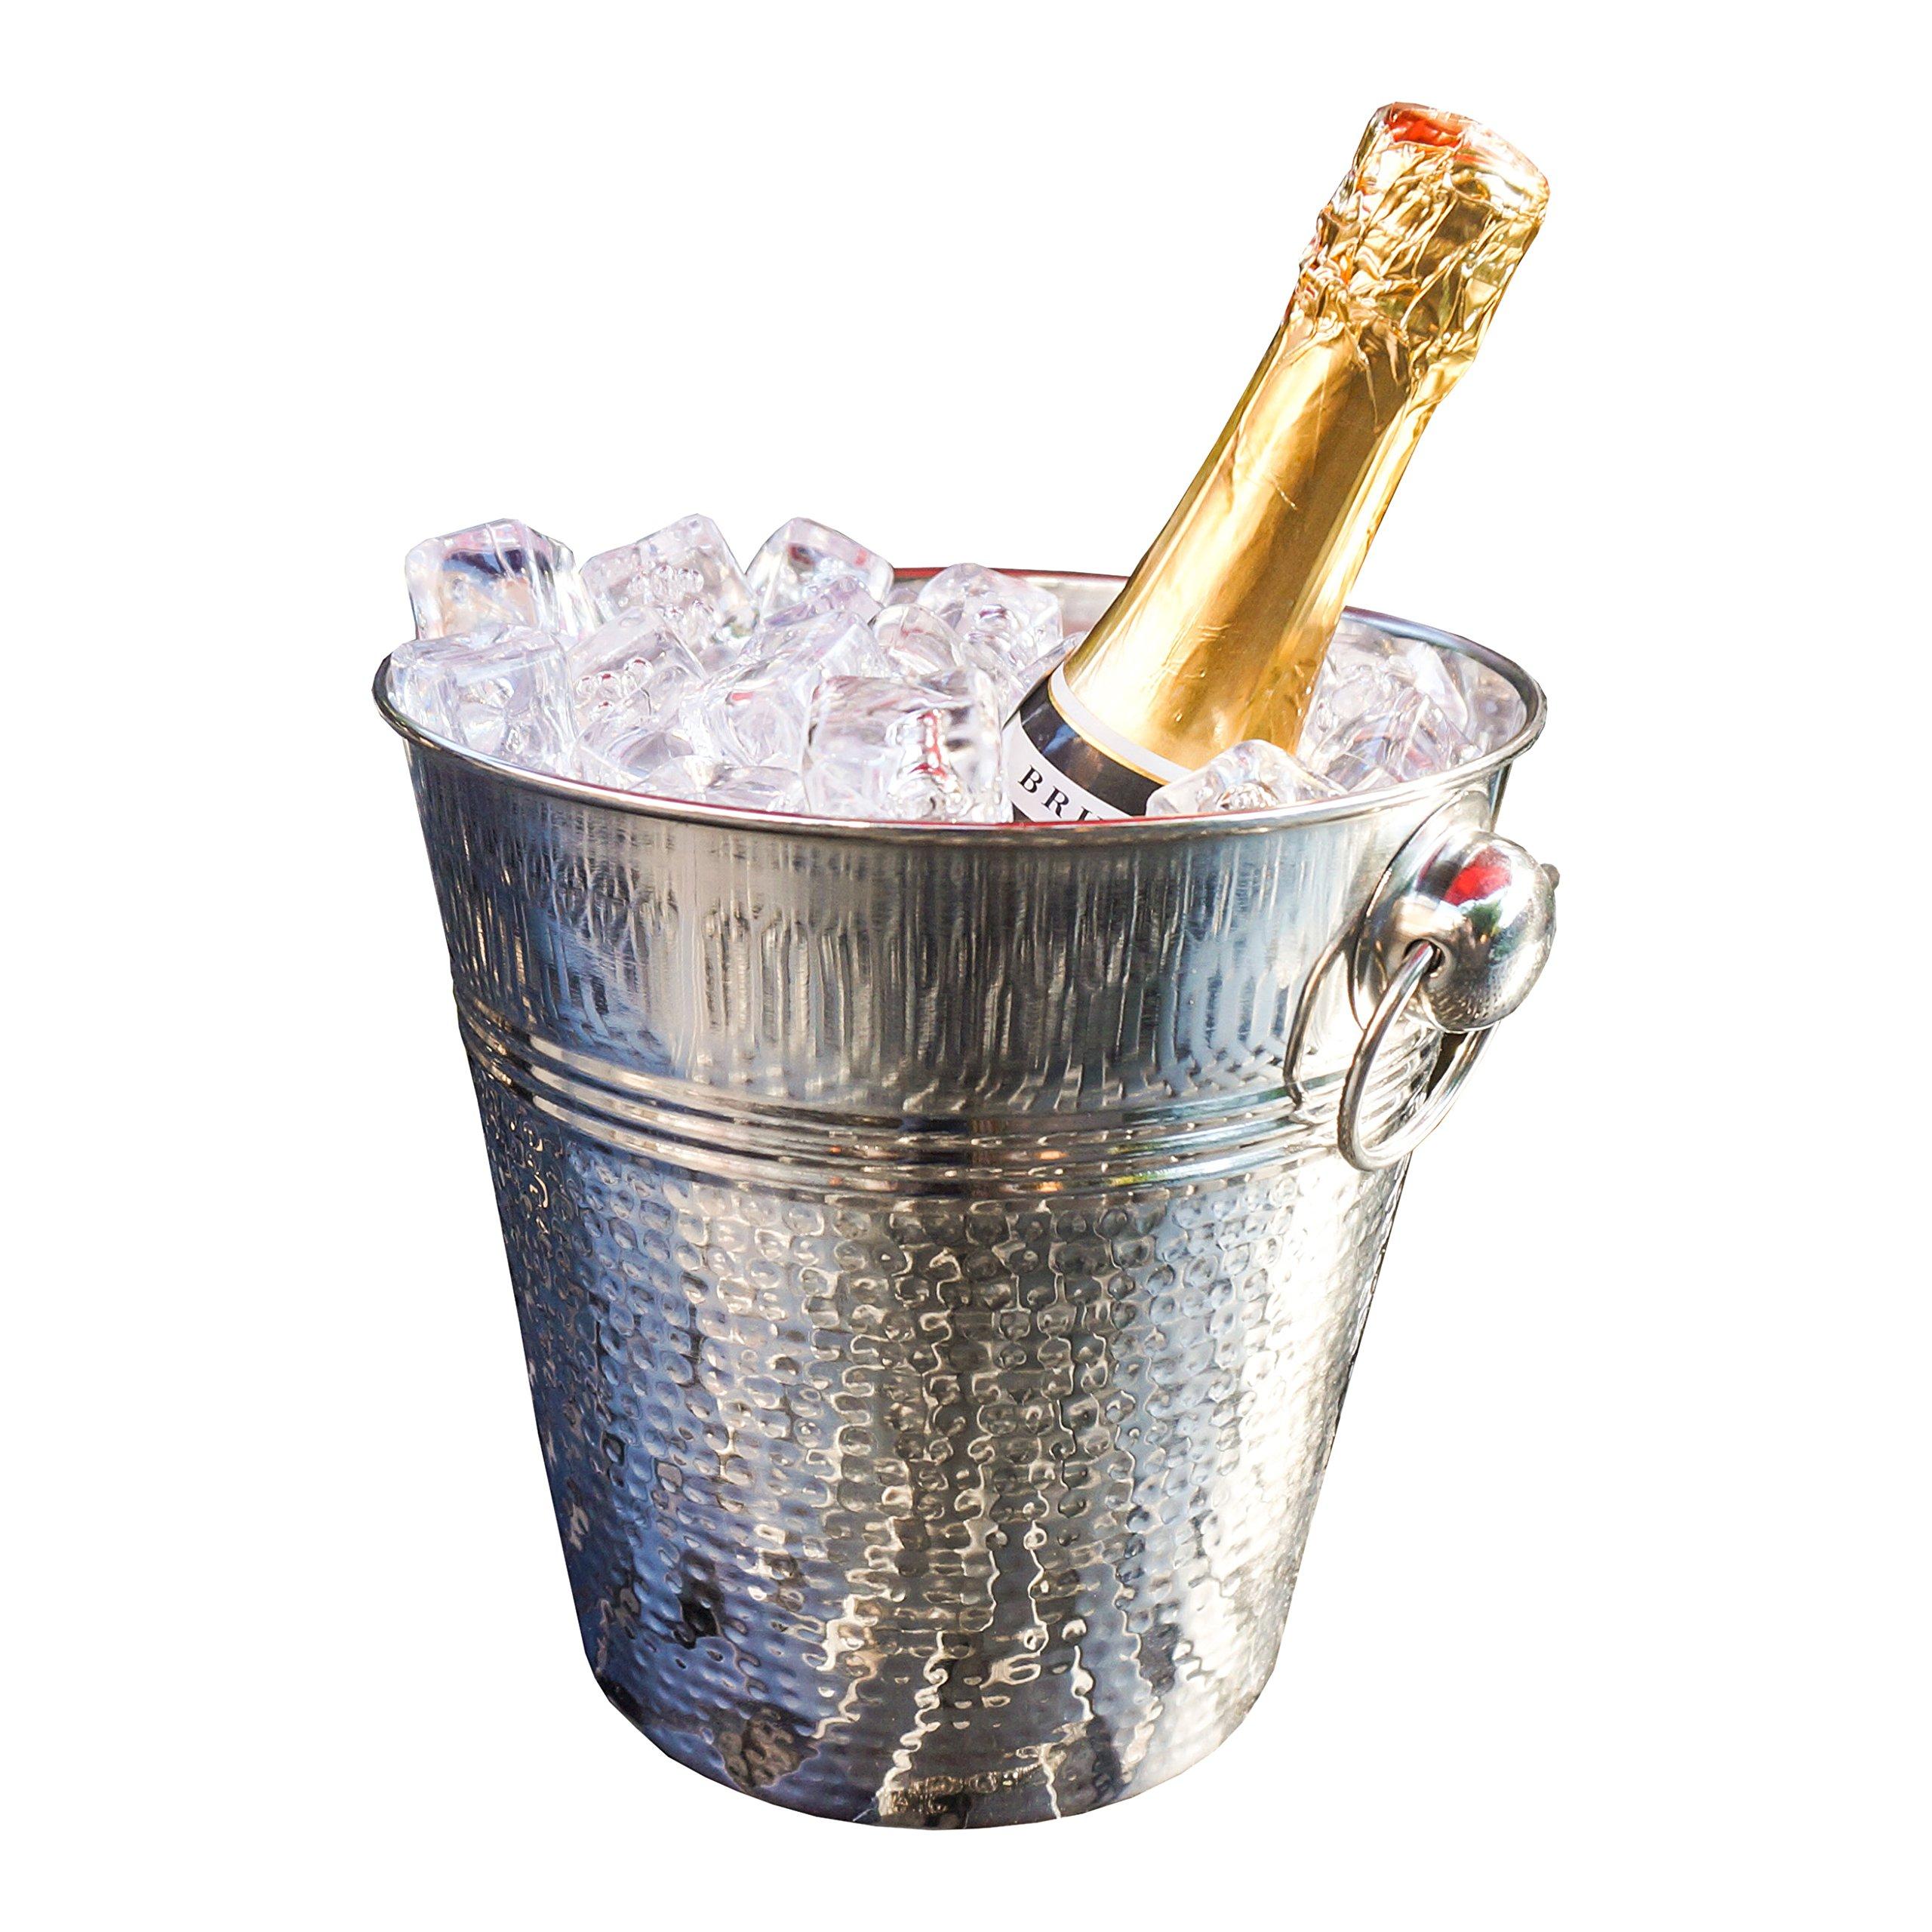 BREKX Napoli Hammered Stainless Steel Luxury Wine Ice Bucket